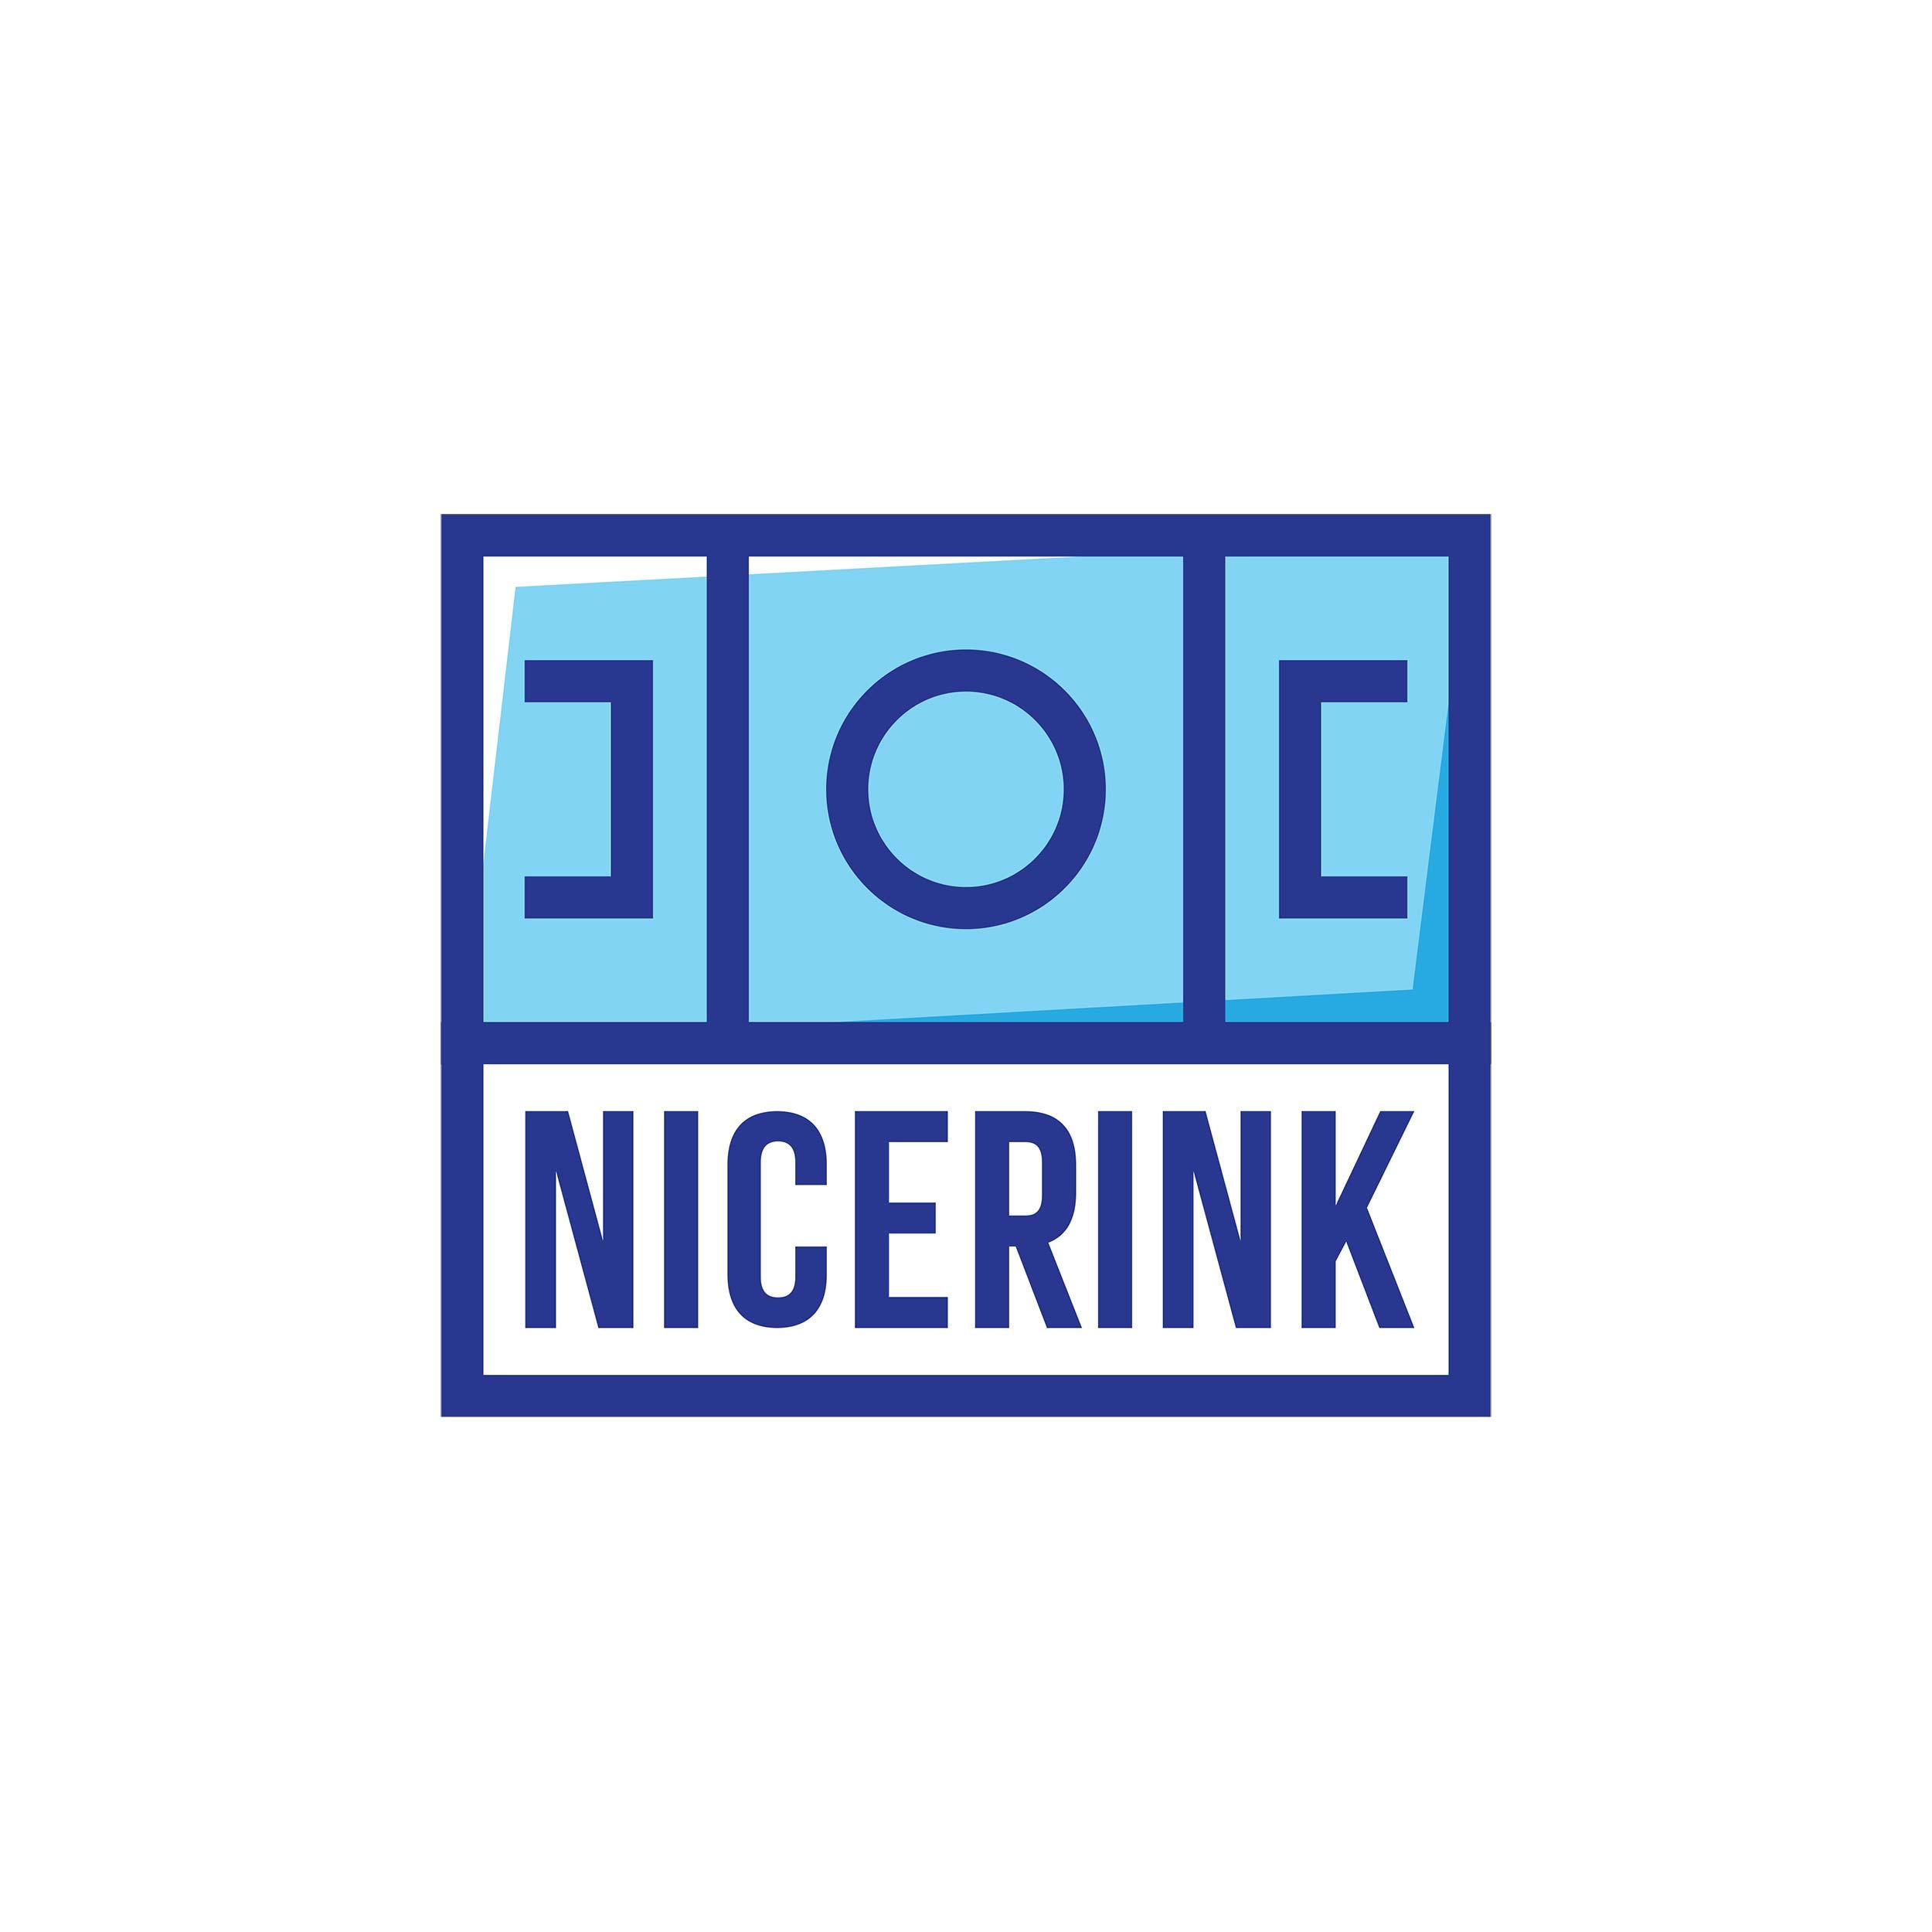 Logo + Branding | NICERINK